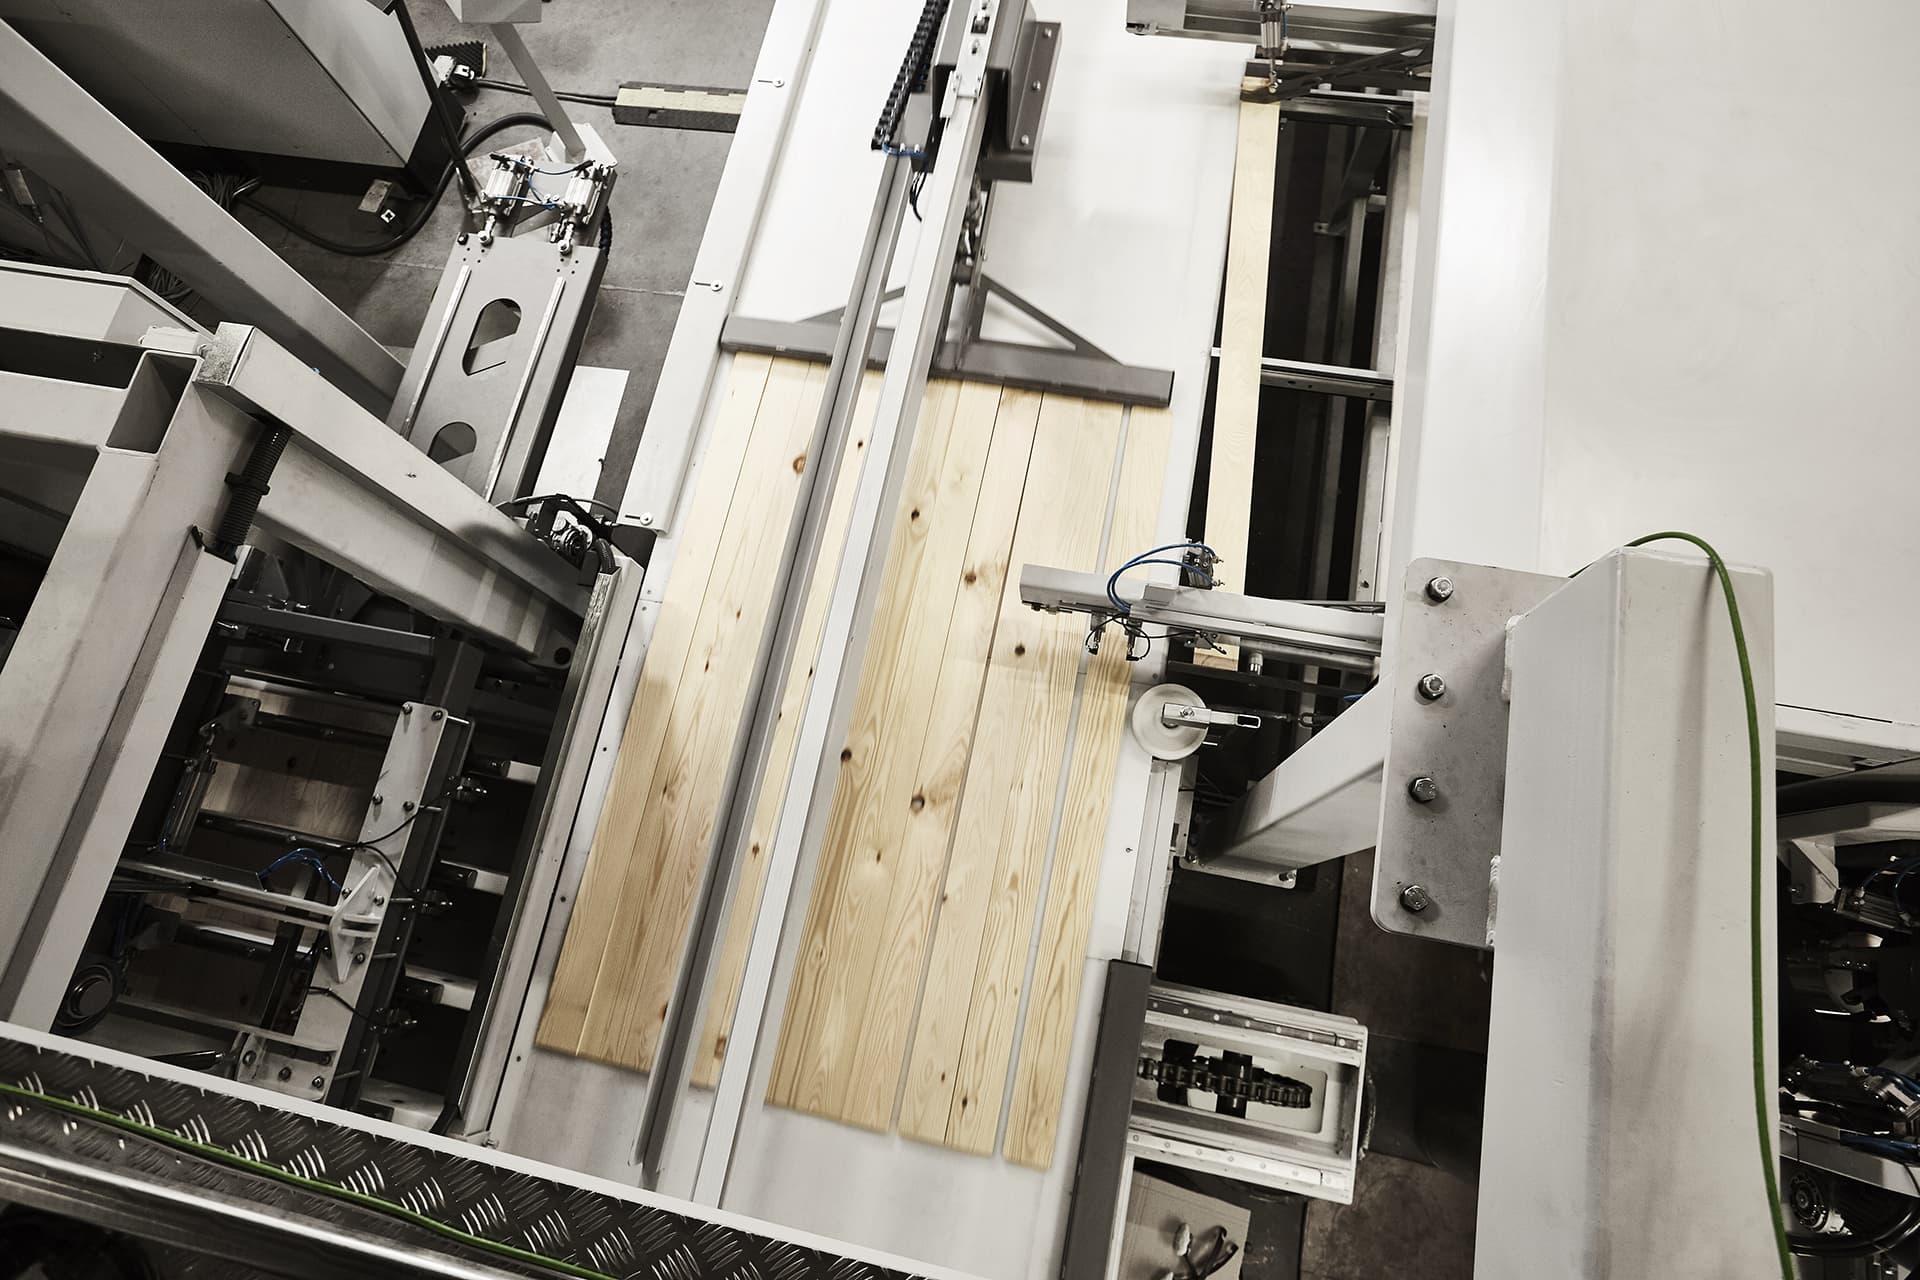 Rogers 15 Ton Punch Press, Press # 20 - Norman Machine Tool